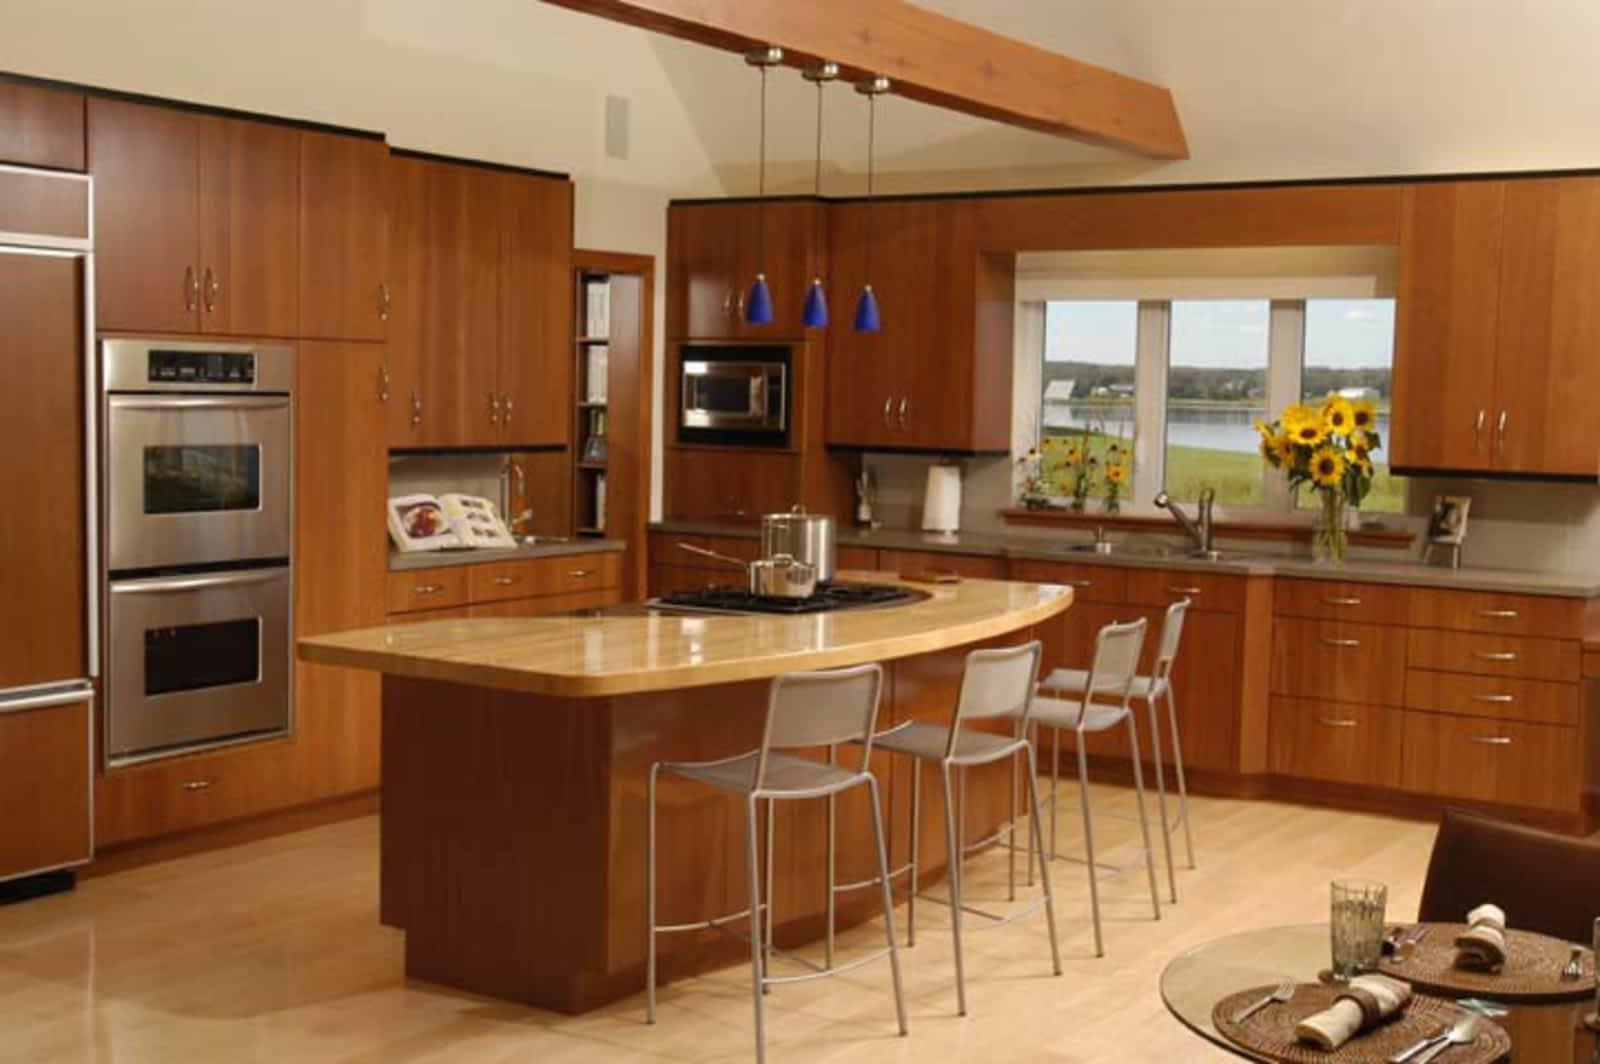 Queen Kitchens & Design - Opening Hours - 28 Fitzmaurice Road ...